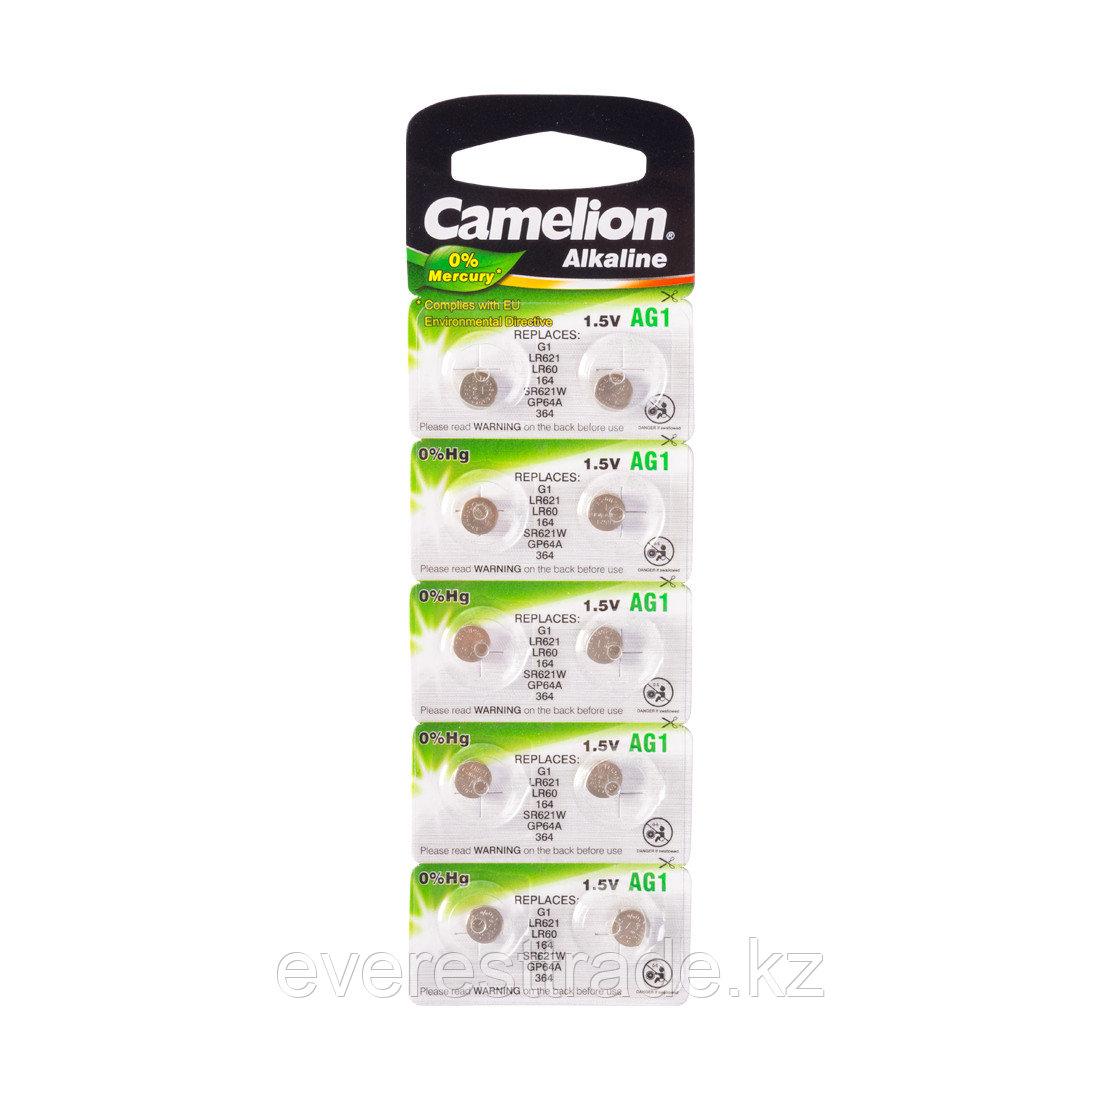 Camelion Батарейки,CAMELION, AG1-BP10, Alkaline, AG1, 1.5V, 0% Ртути, 10 шт. в блистере